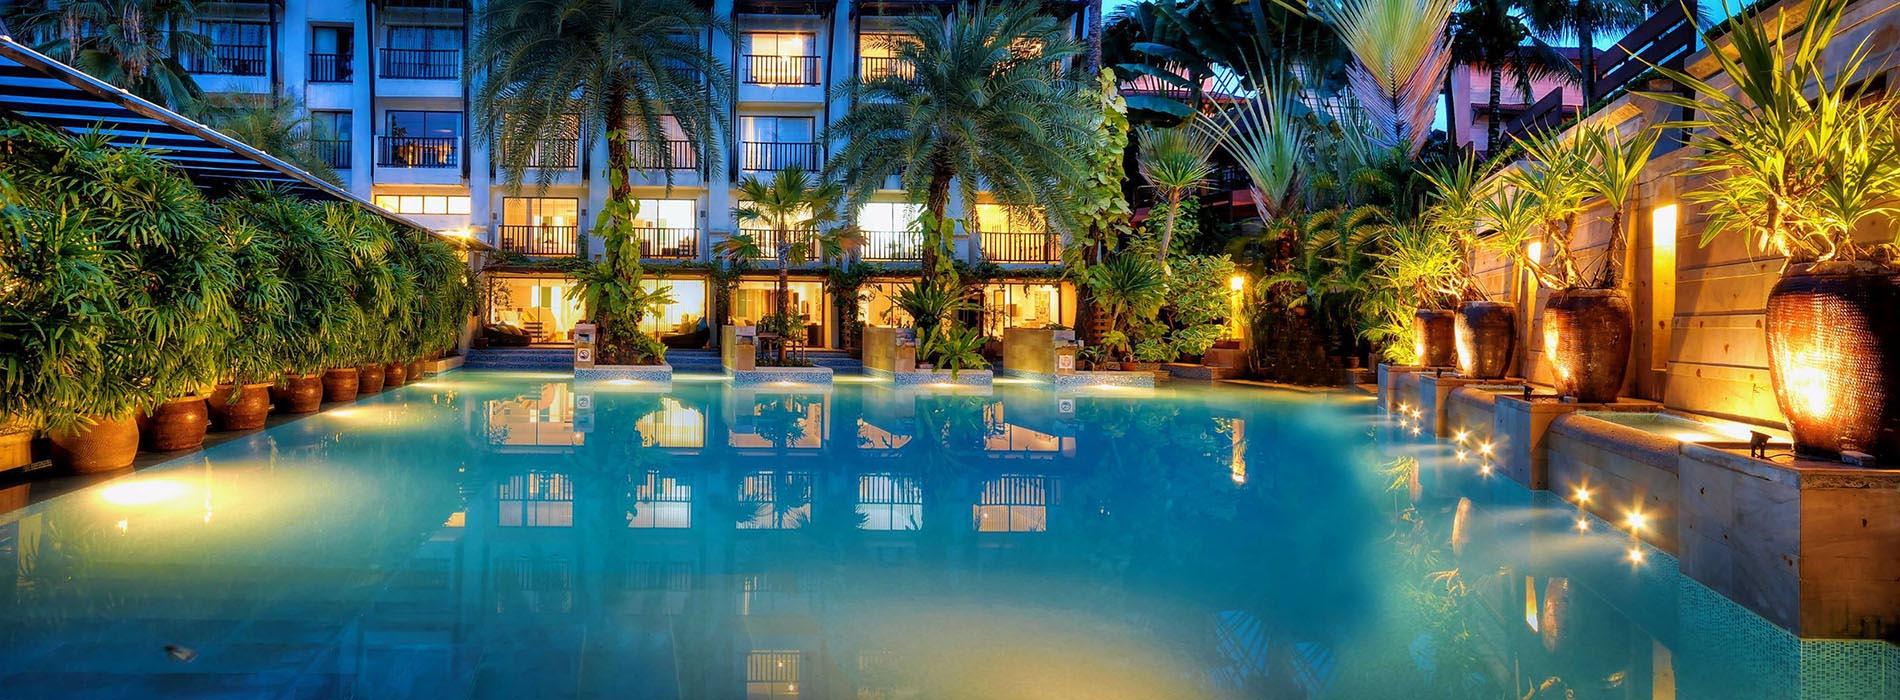 Burasari hôtel, Phuket, Thaïlande